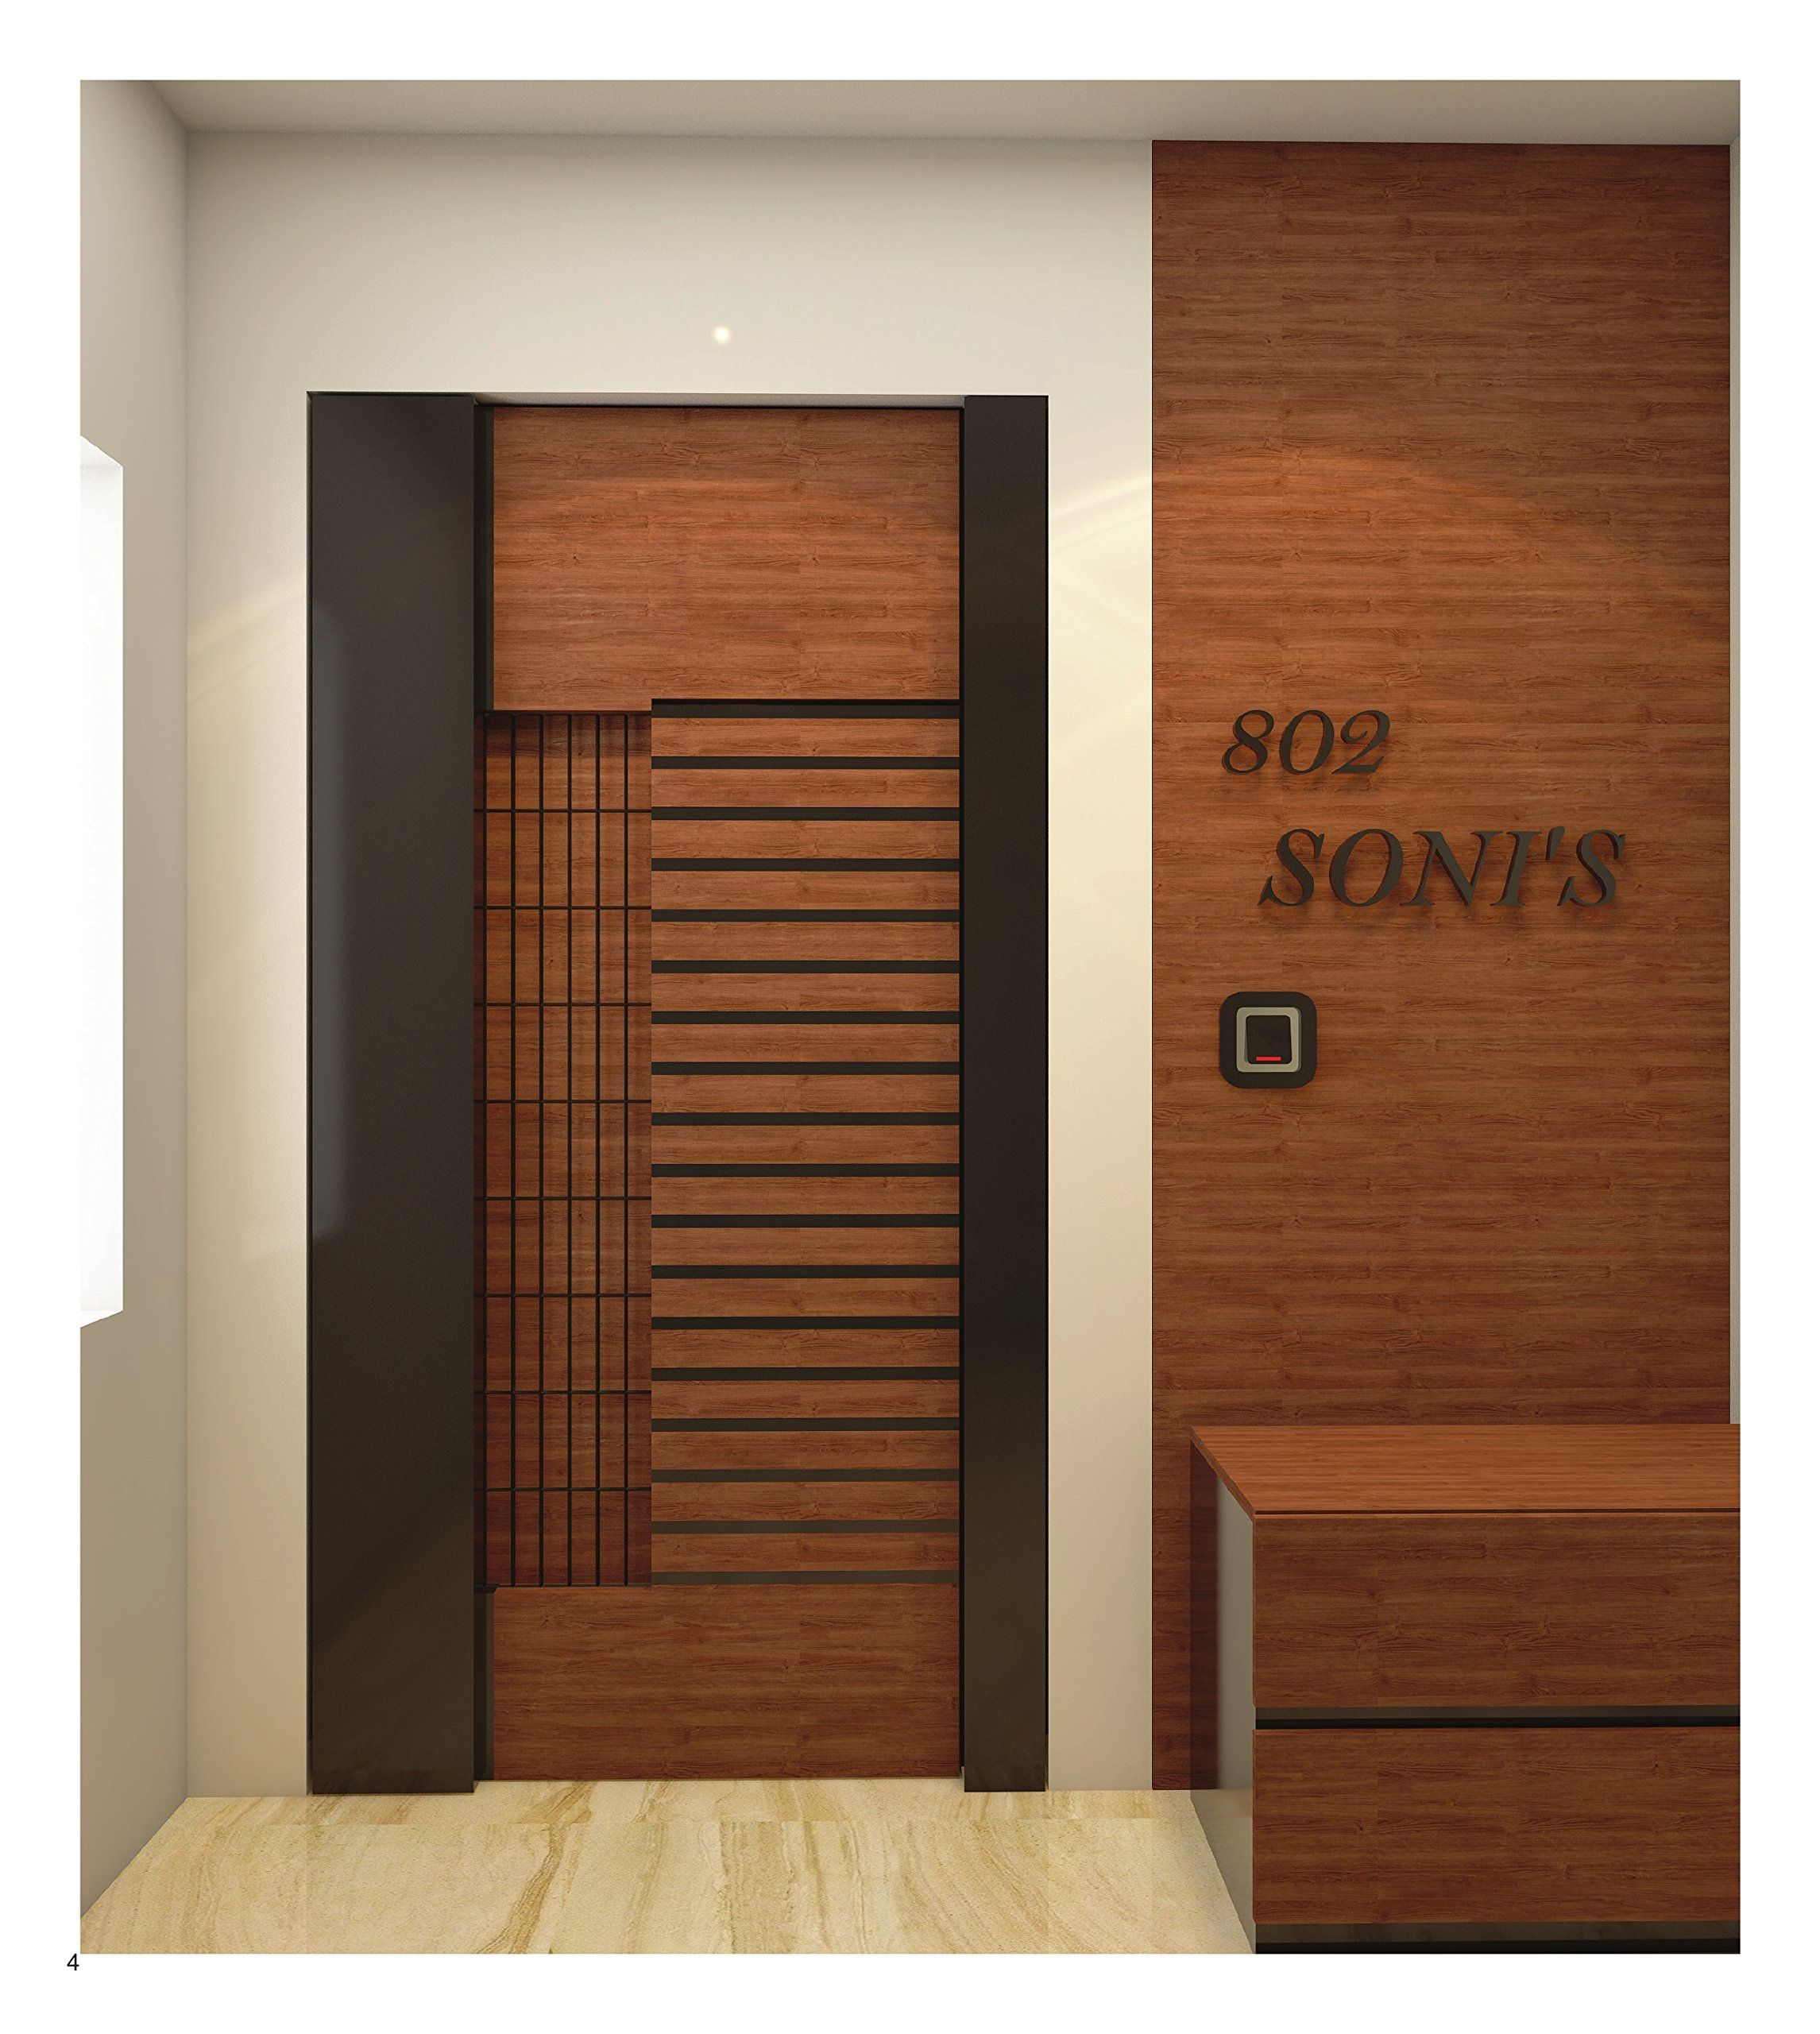 Contemporary Door Design Ideas: Wooden Safety Door Designs For Homes